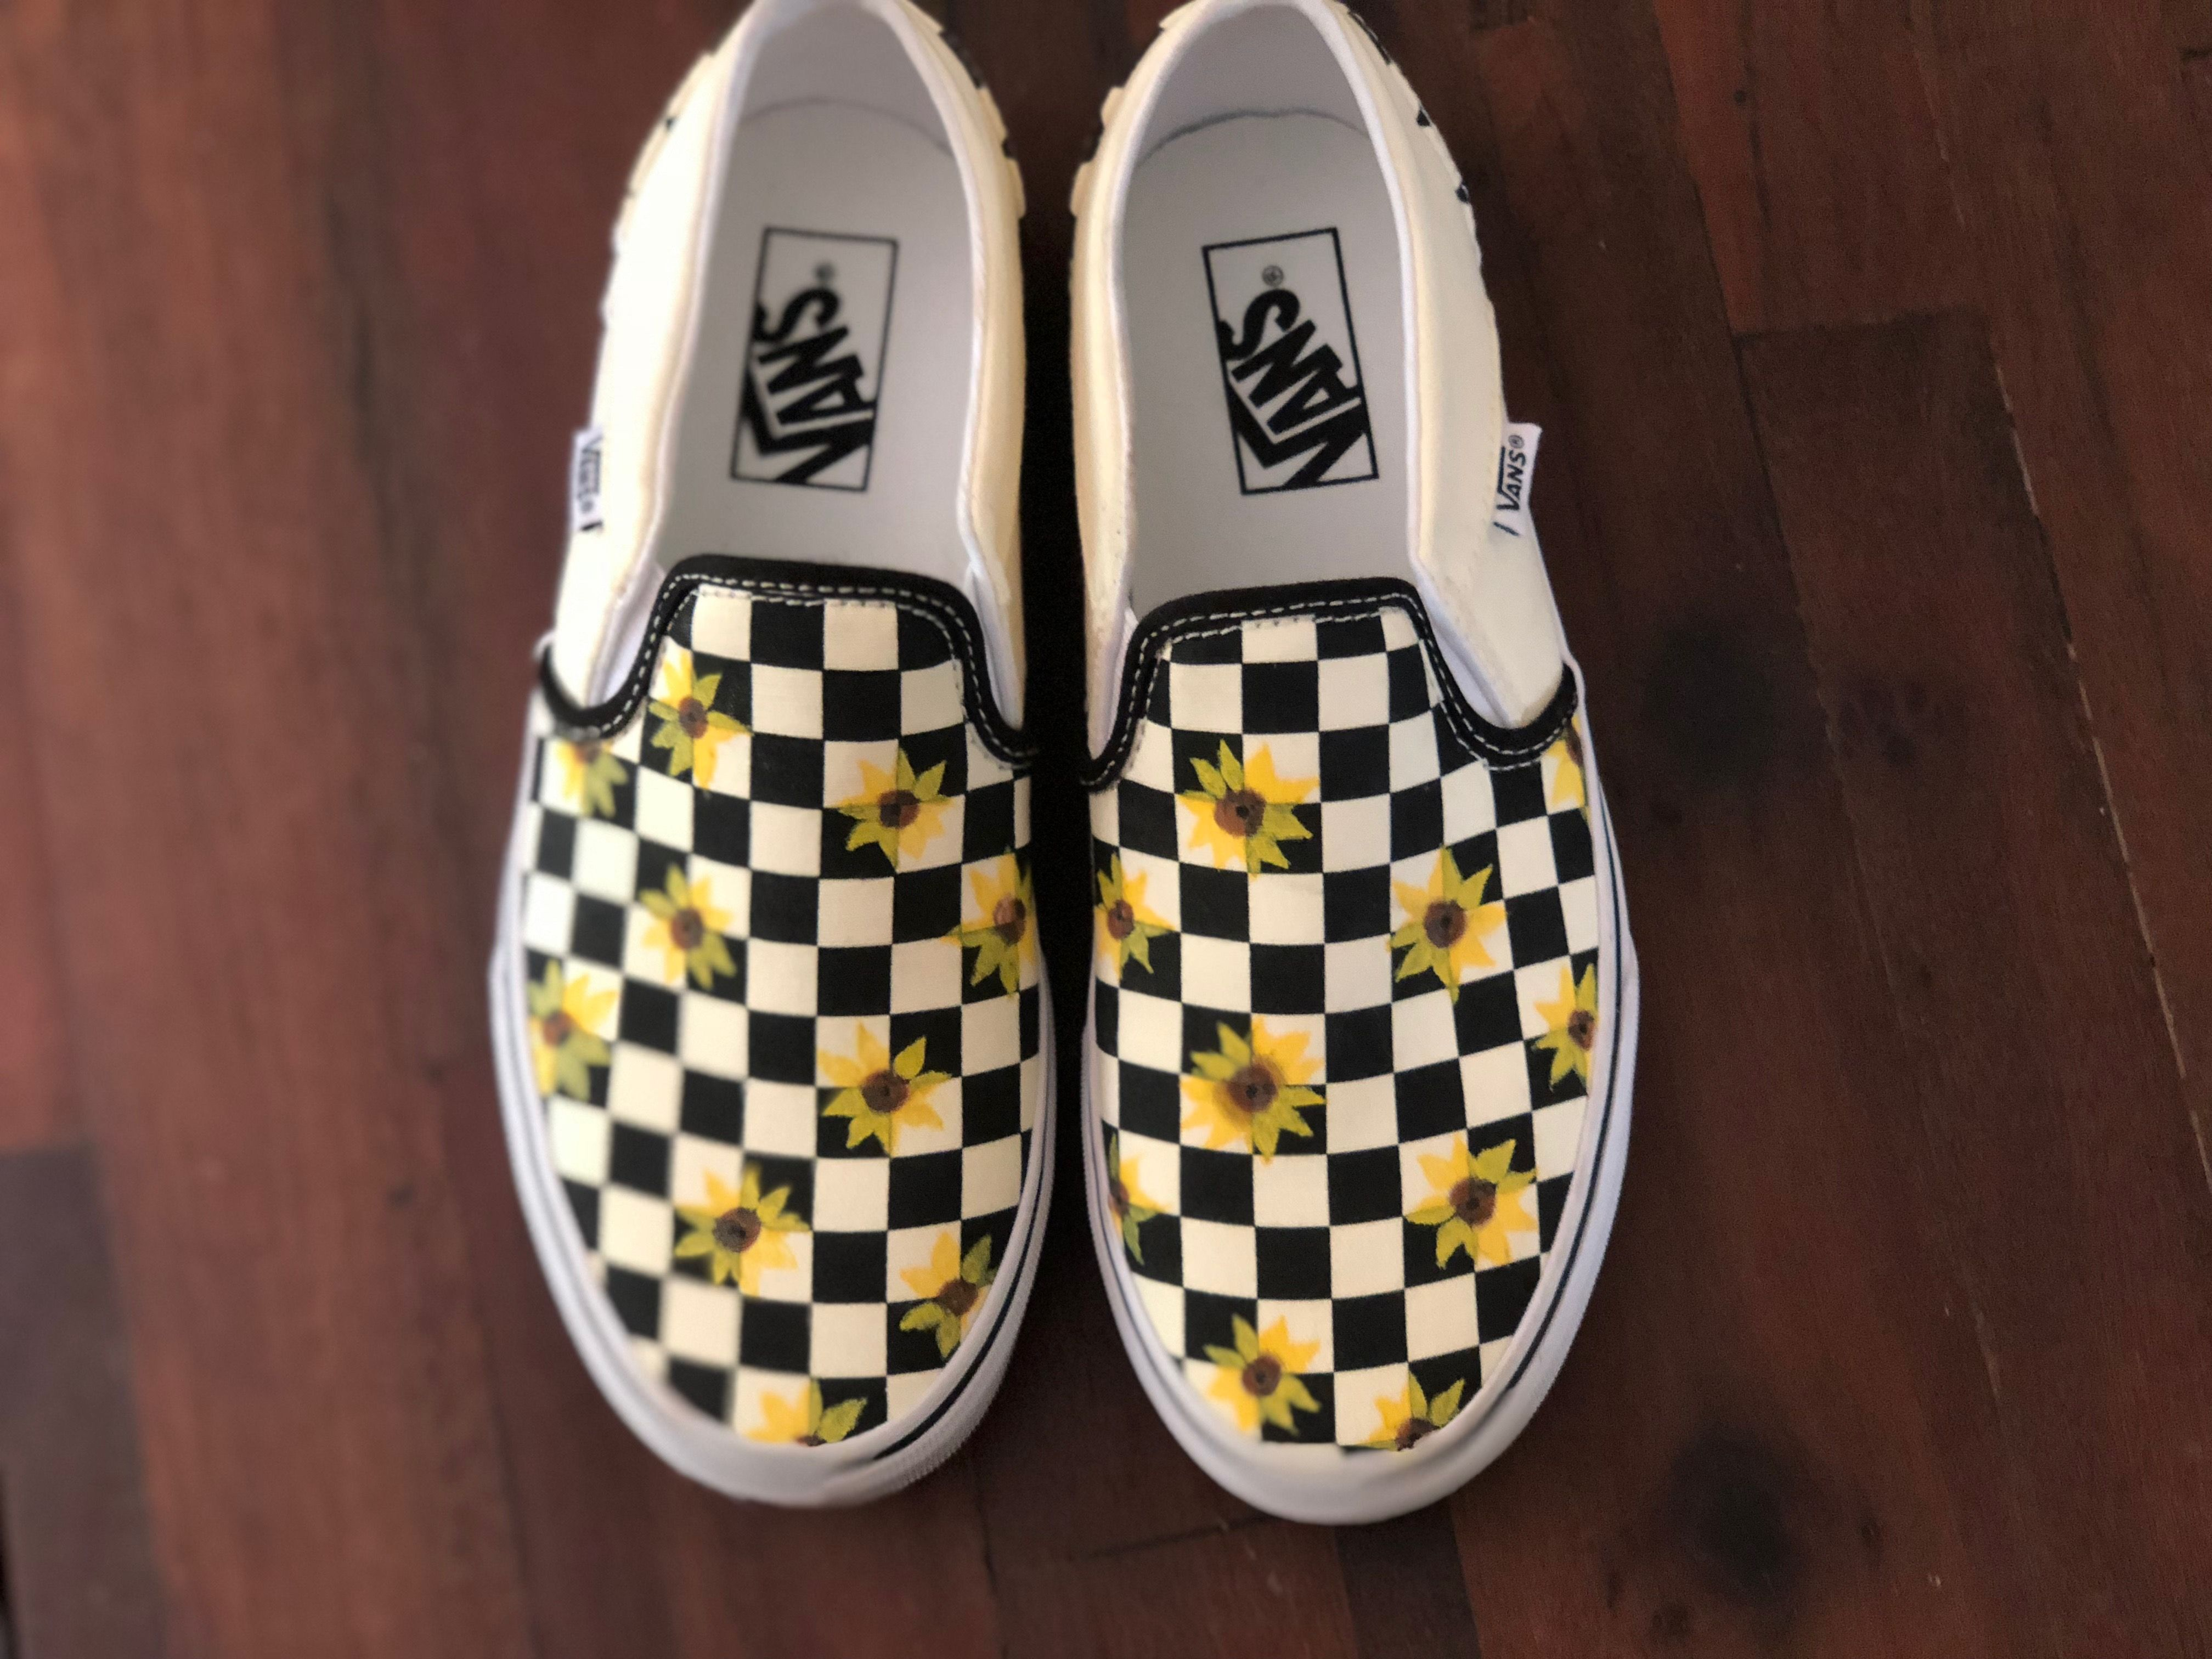 Sunflower slip on vans, Painted shoes